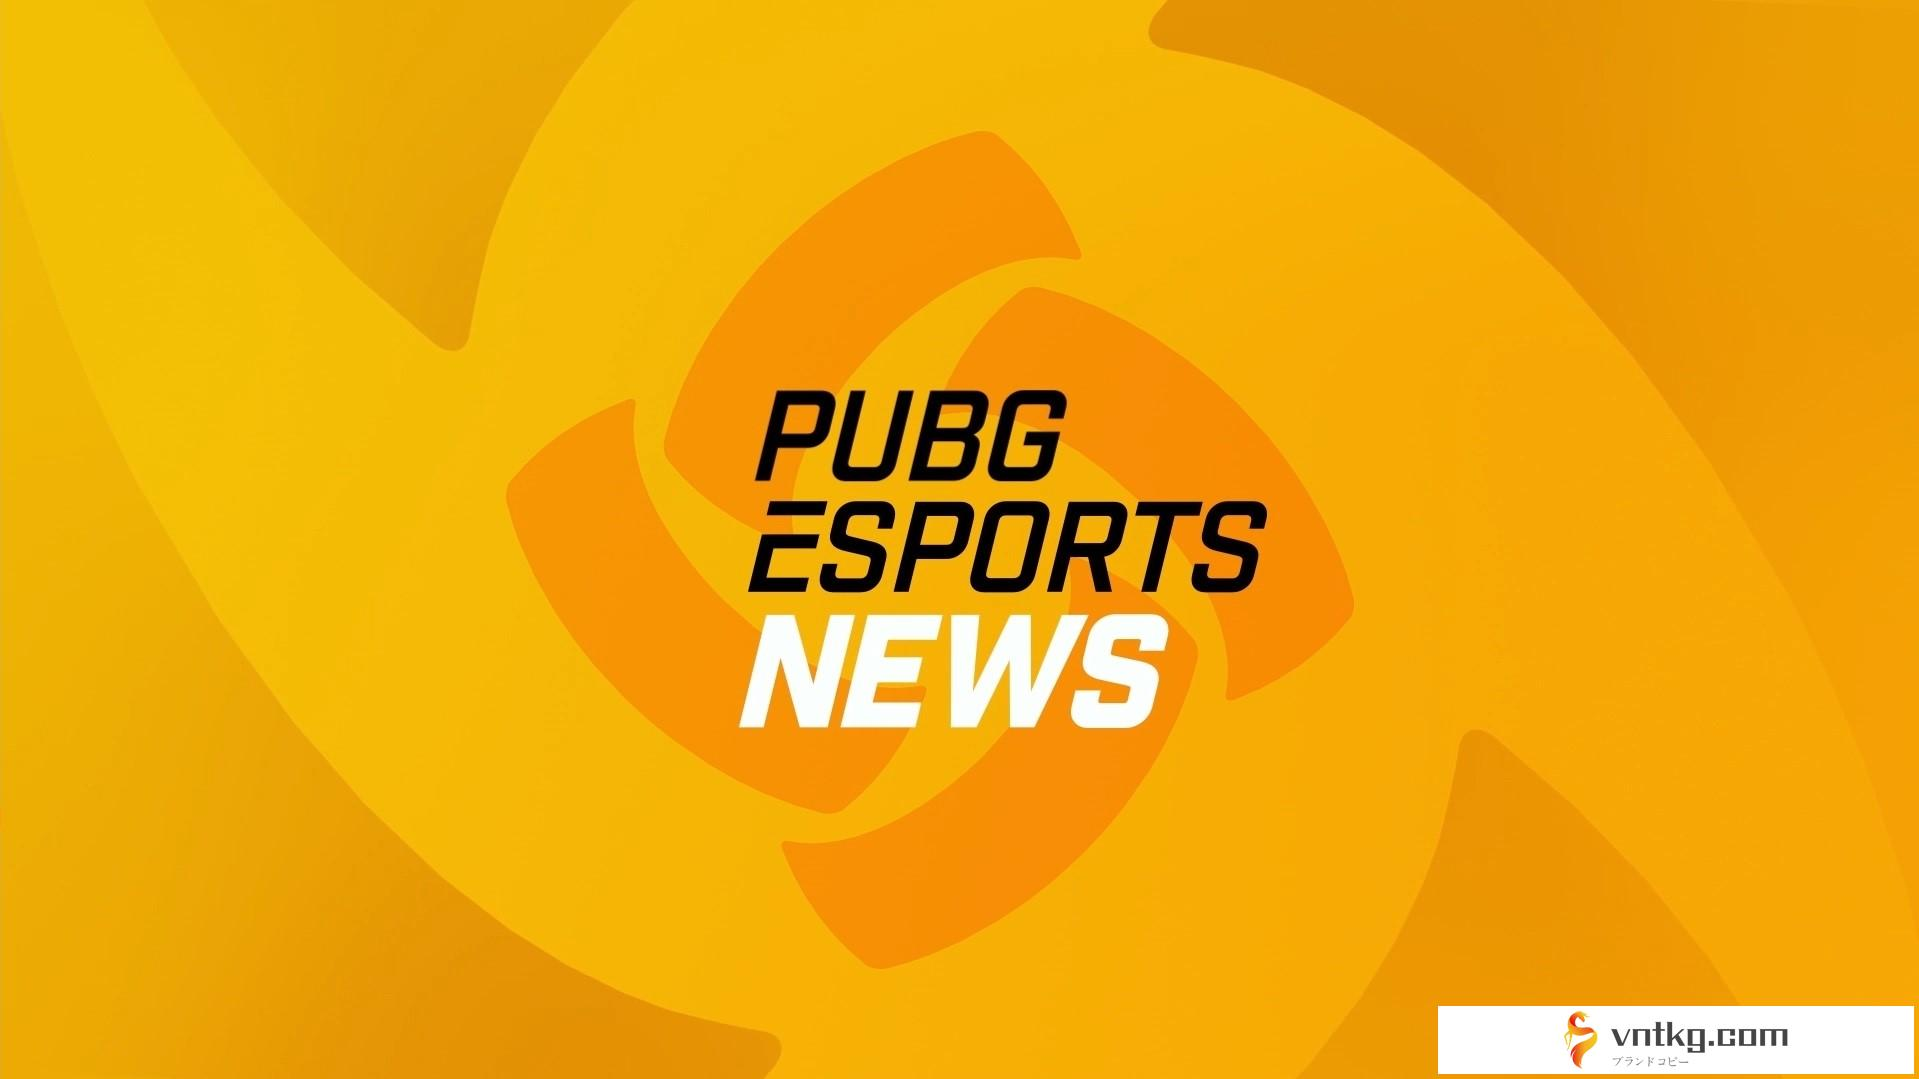 【日本語字幕付き】PUBG Esports News #1